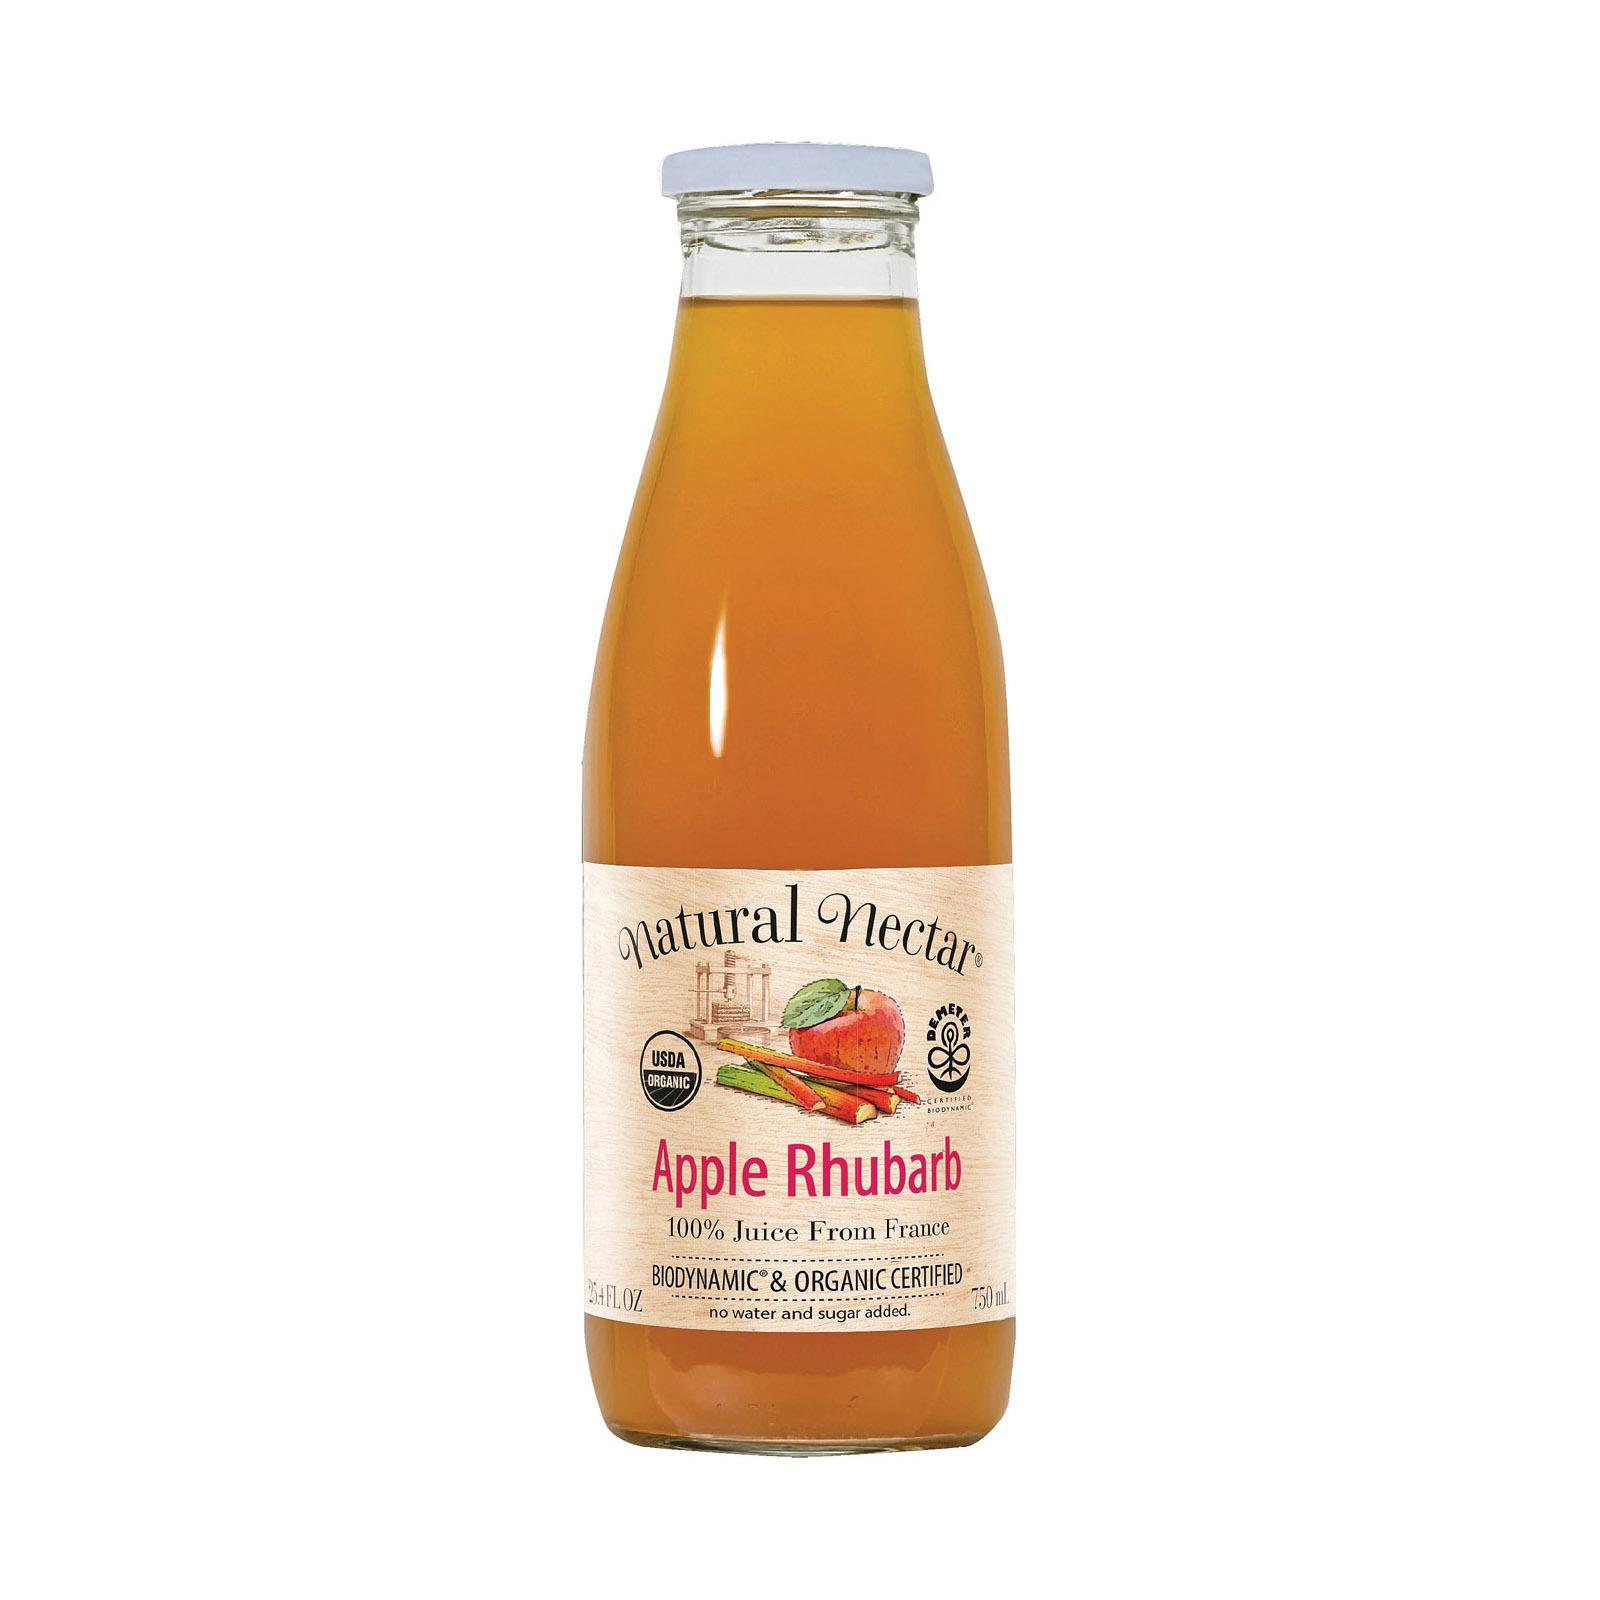 Natural Nectar Fruit Juices - Apple Rhubarb - Case of 6 - 25.4 Fl oz.